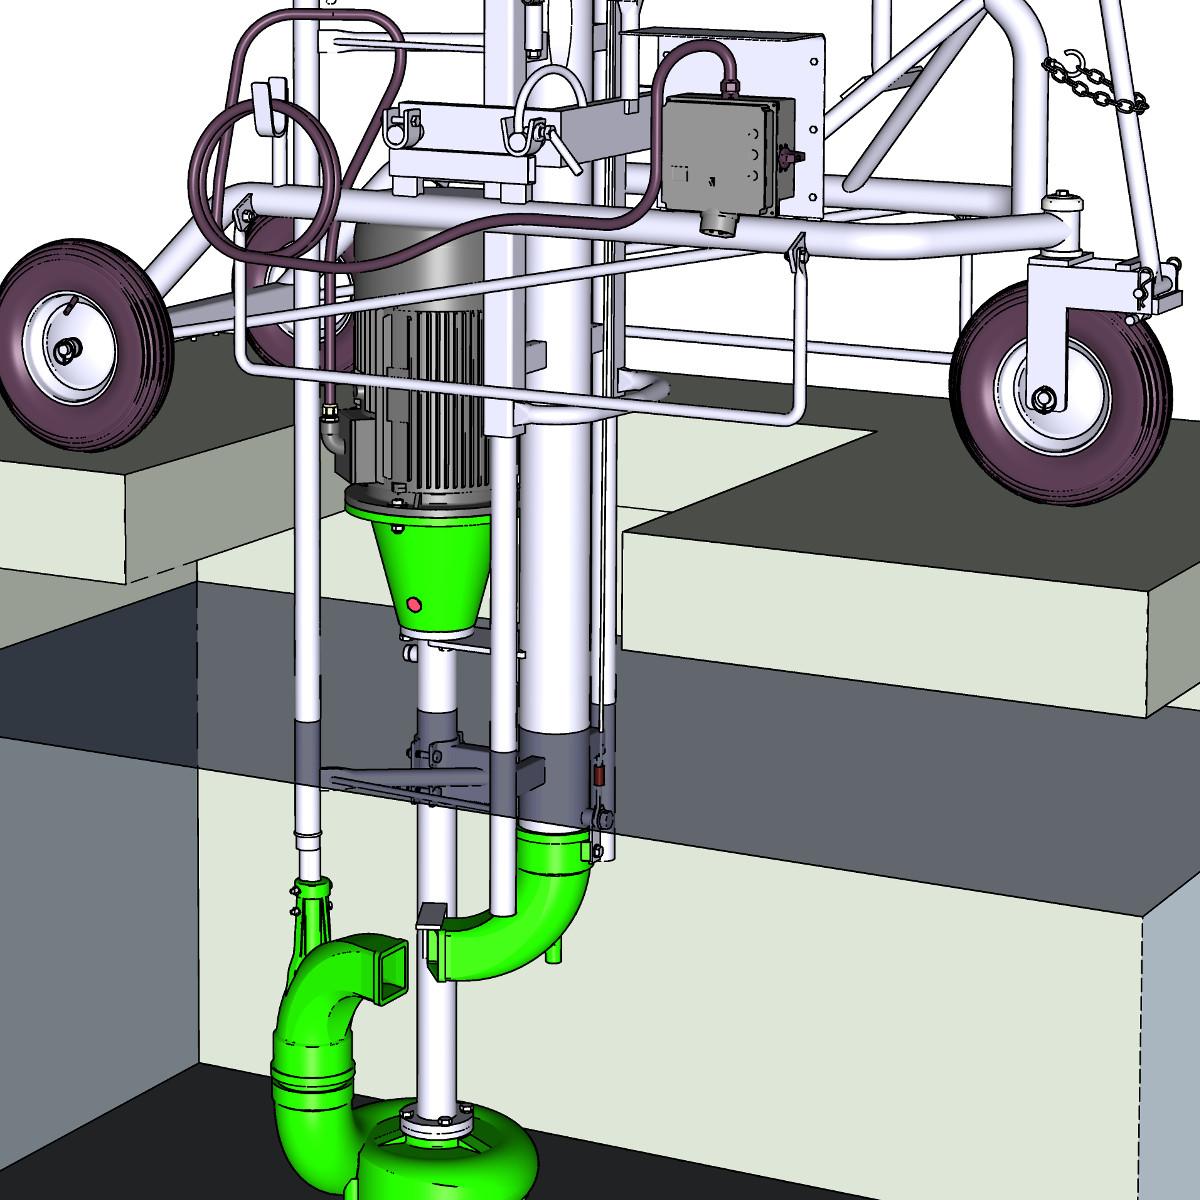 mobile, flexibel einsetzbare Güllepumpe mit Fahrgestell